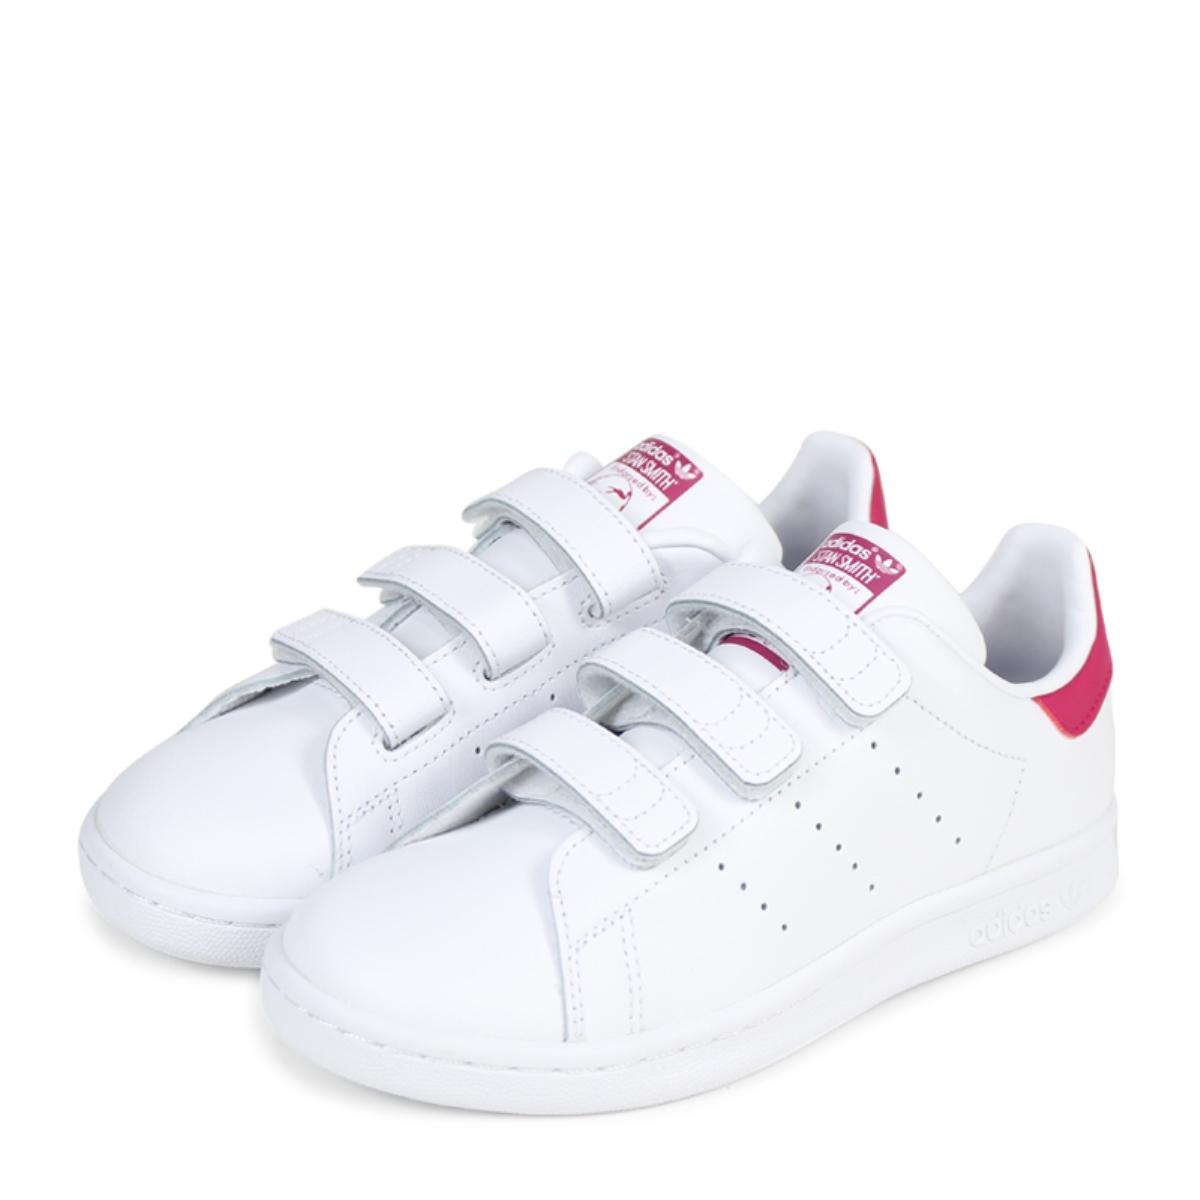 [SOLD OUT]아디다스오리지나르스 adidas Originals 스탠스 미스 스니커 키